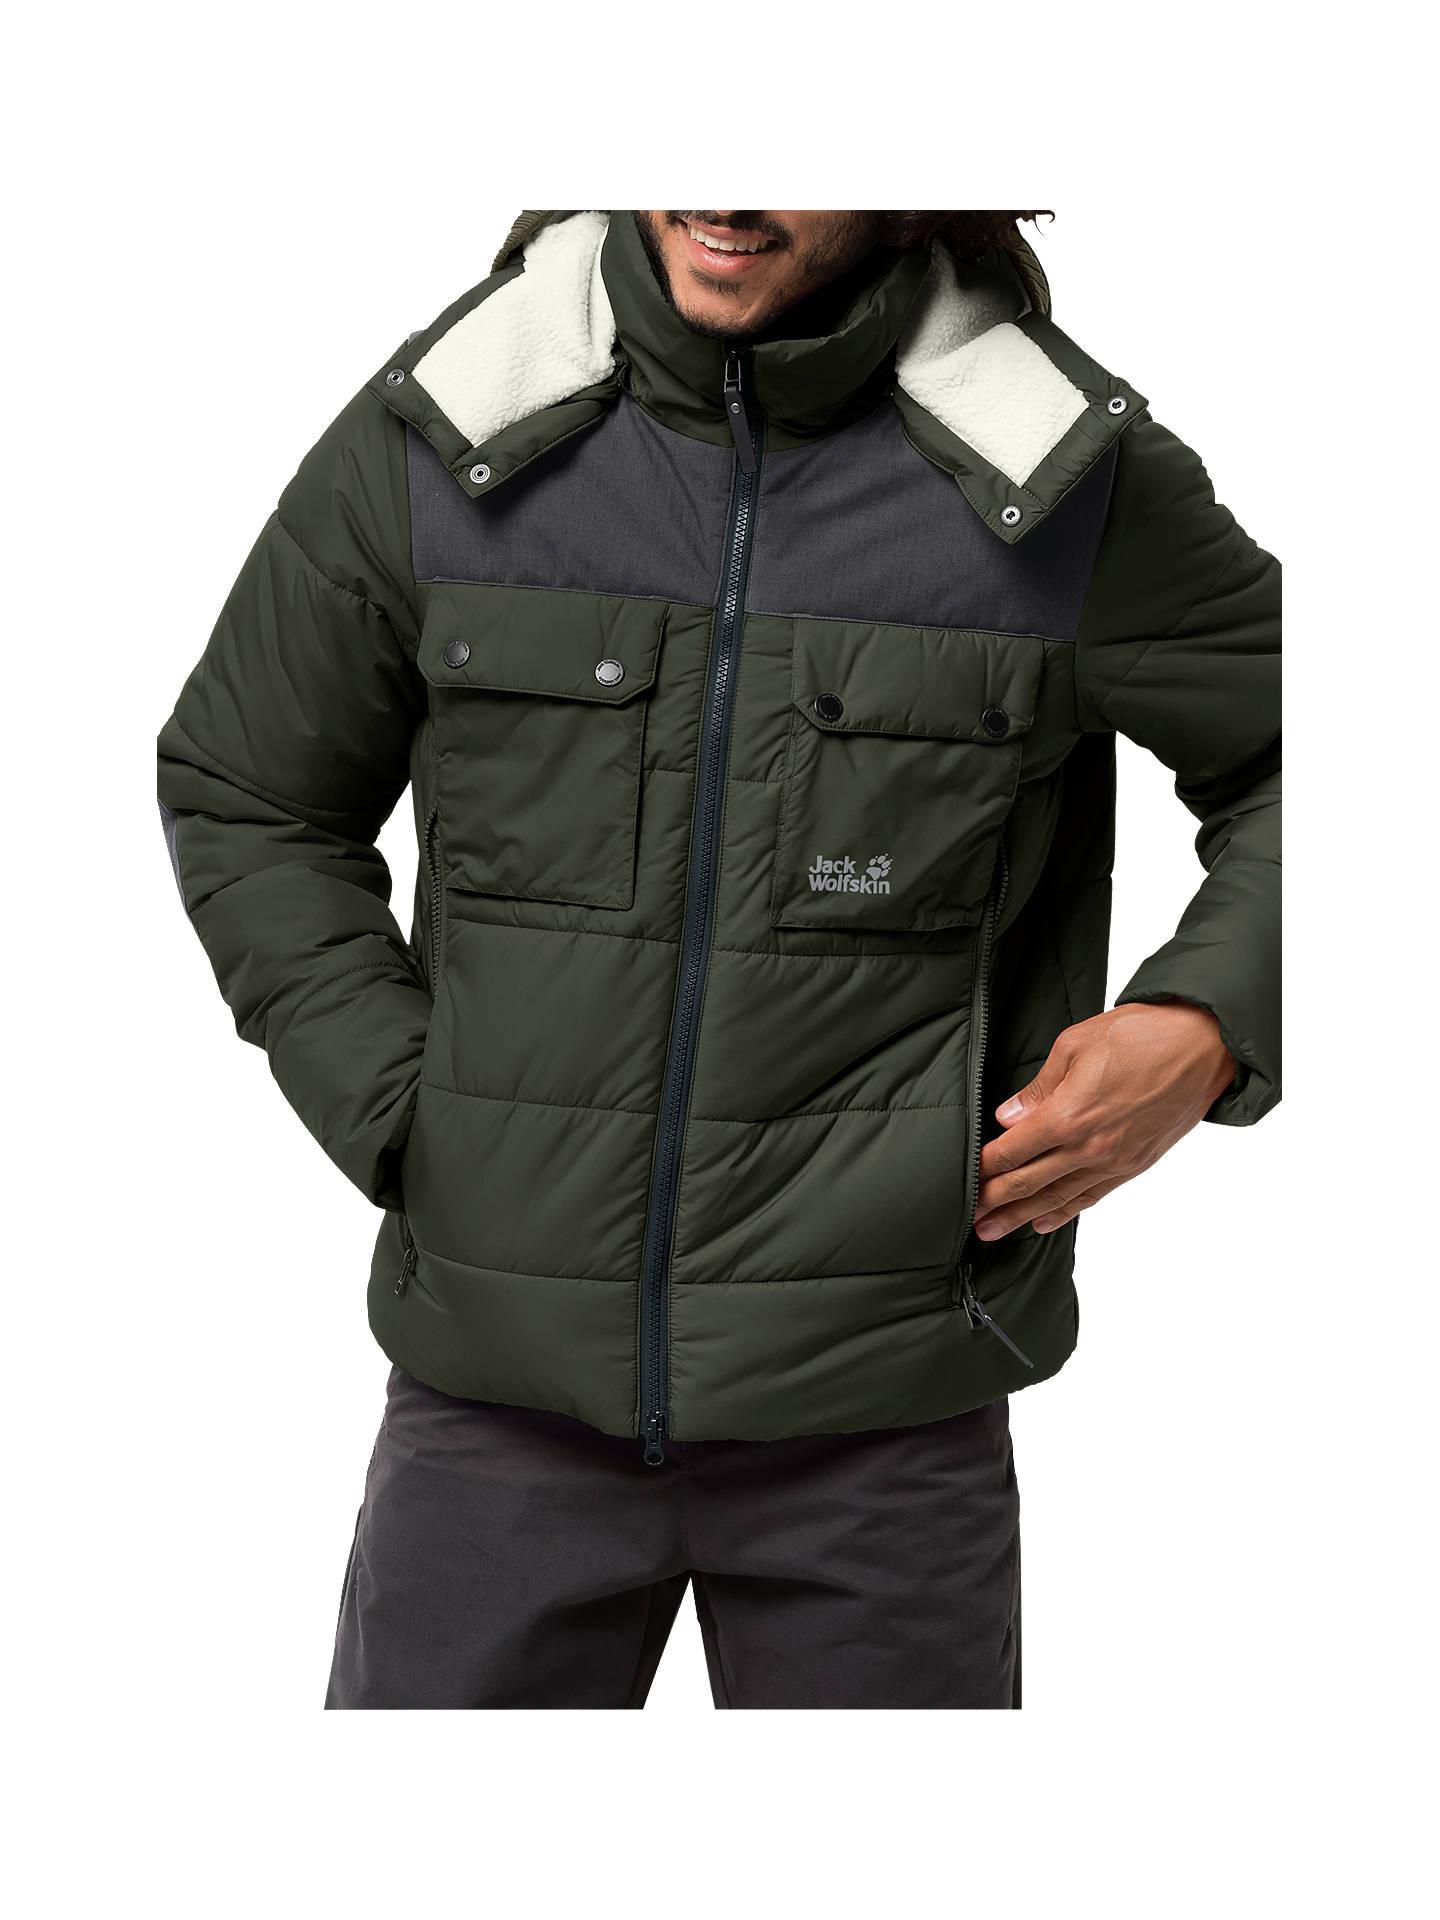 56590f7828 Buy Jack Wolfskin High Range Insulated Men's Jacket, Pinewood, M Online at  johnlewis.